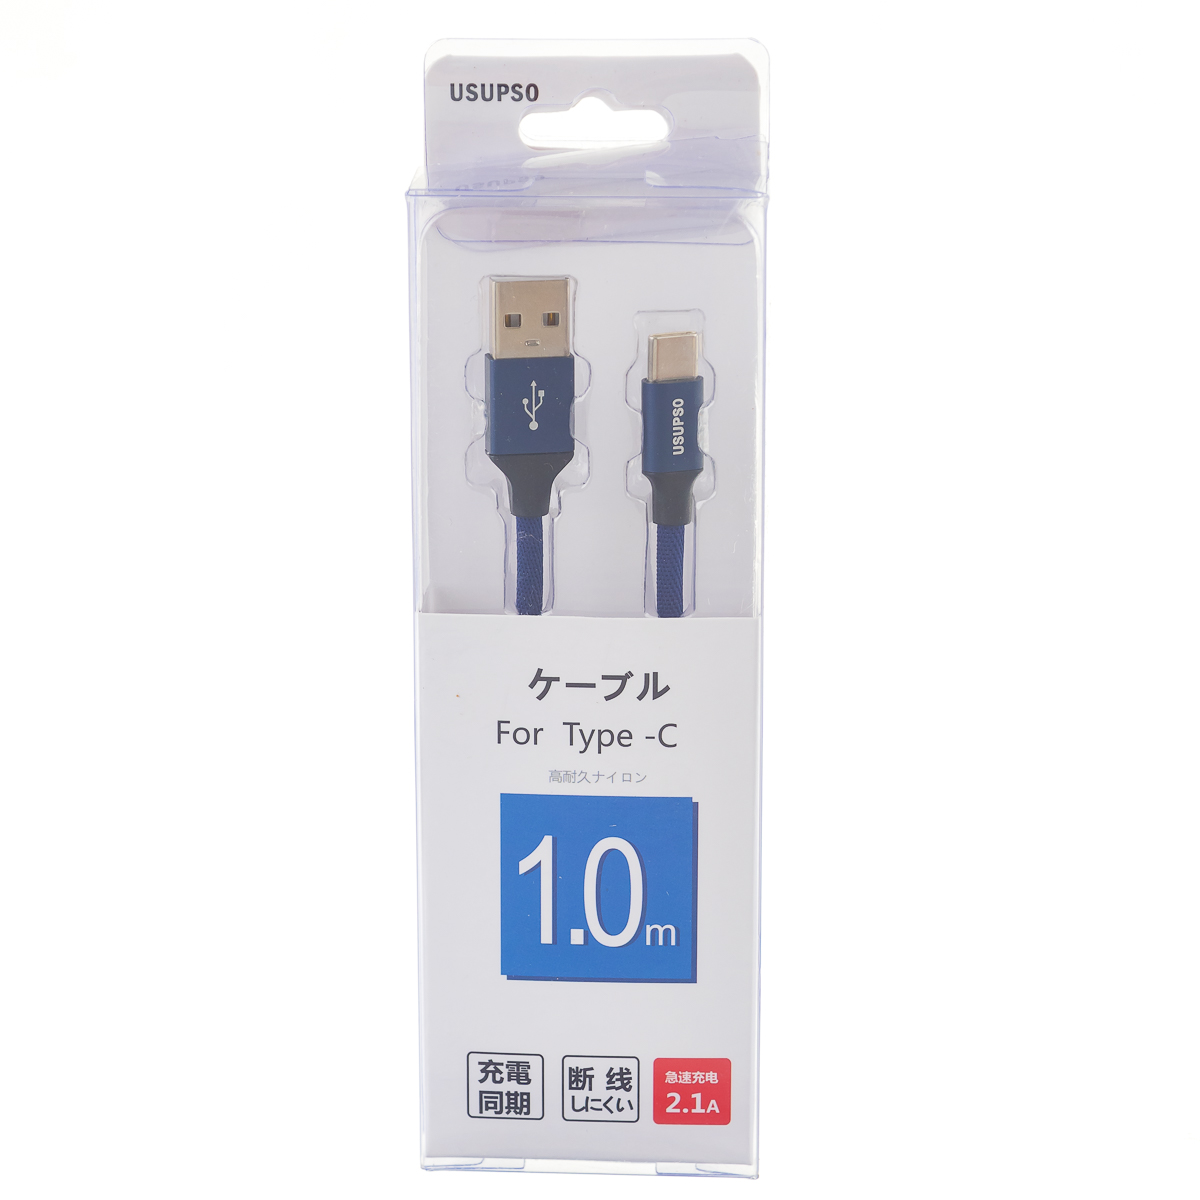 Дата-кабель Type-C синий 1 м